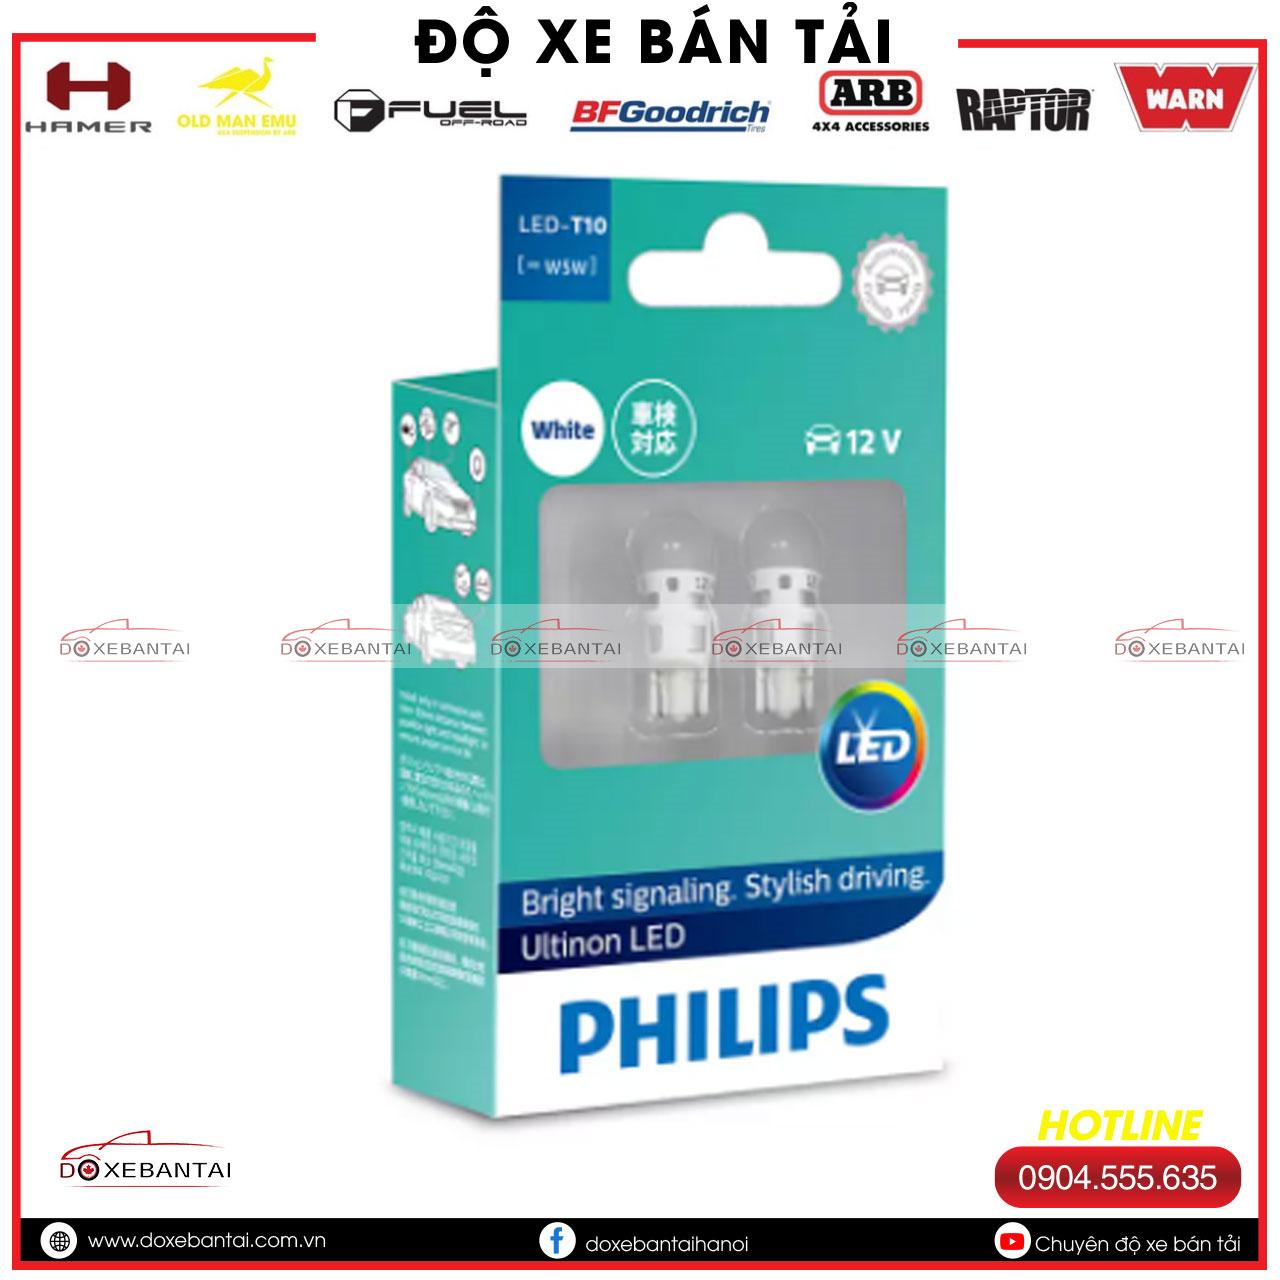 Bong-den-LED-T10-[~W5W]-Philips-Ultinon-cuong-do-cao-2.jpg